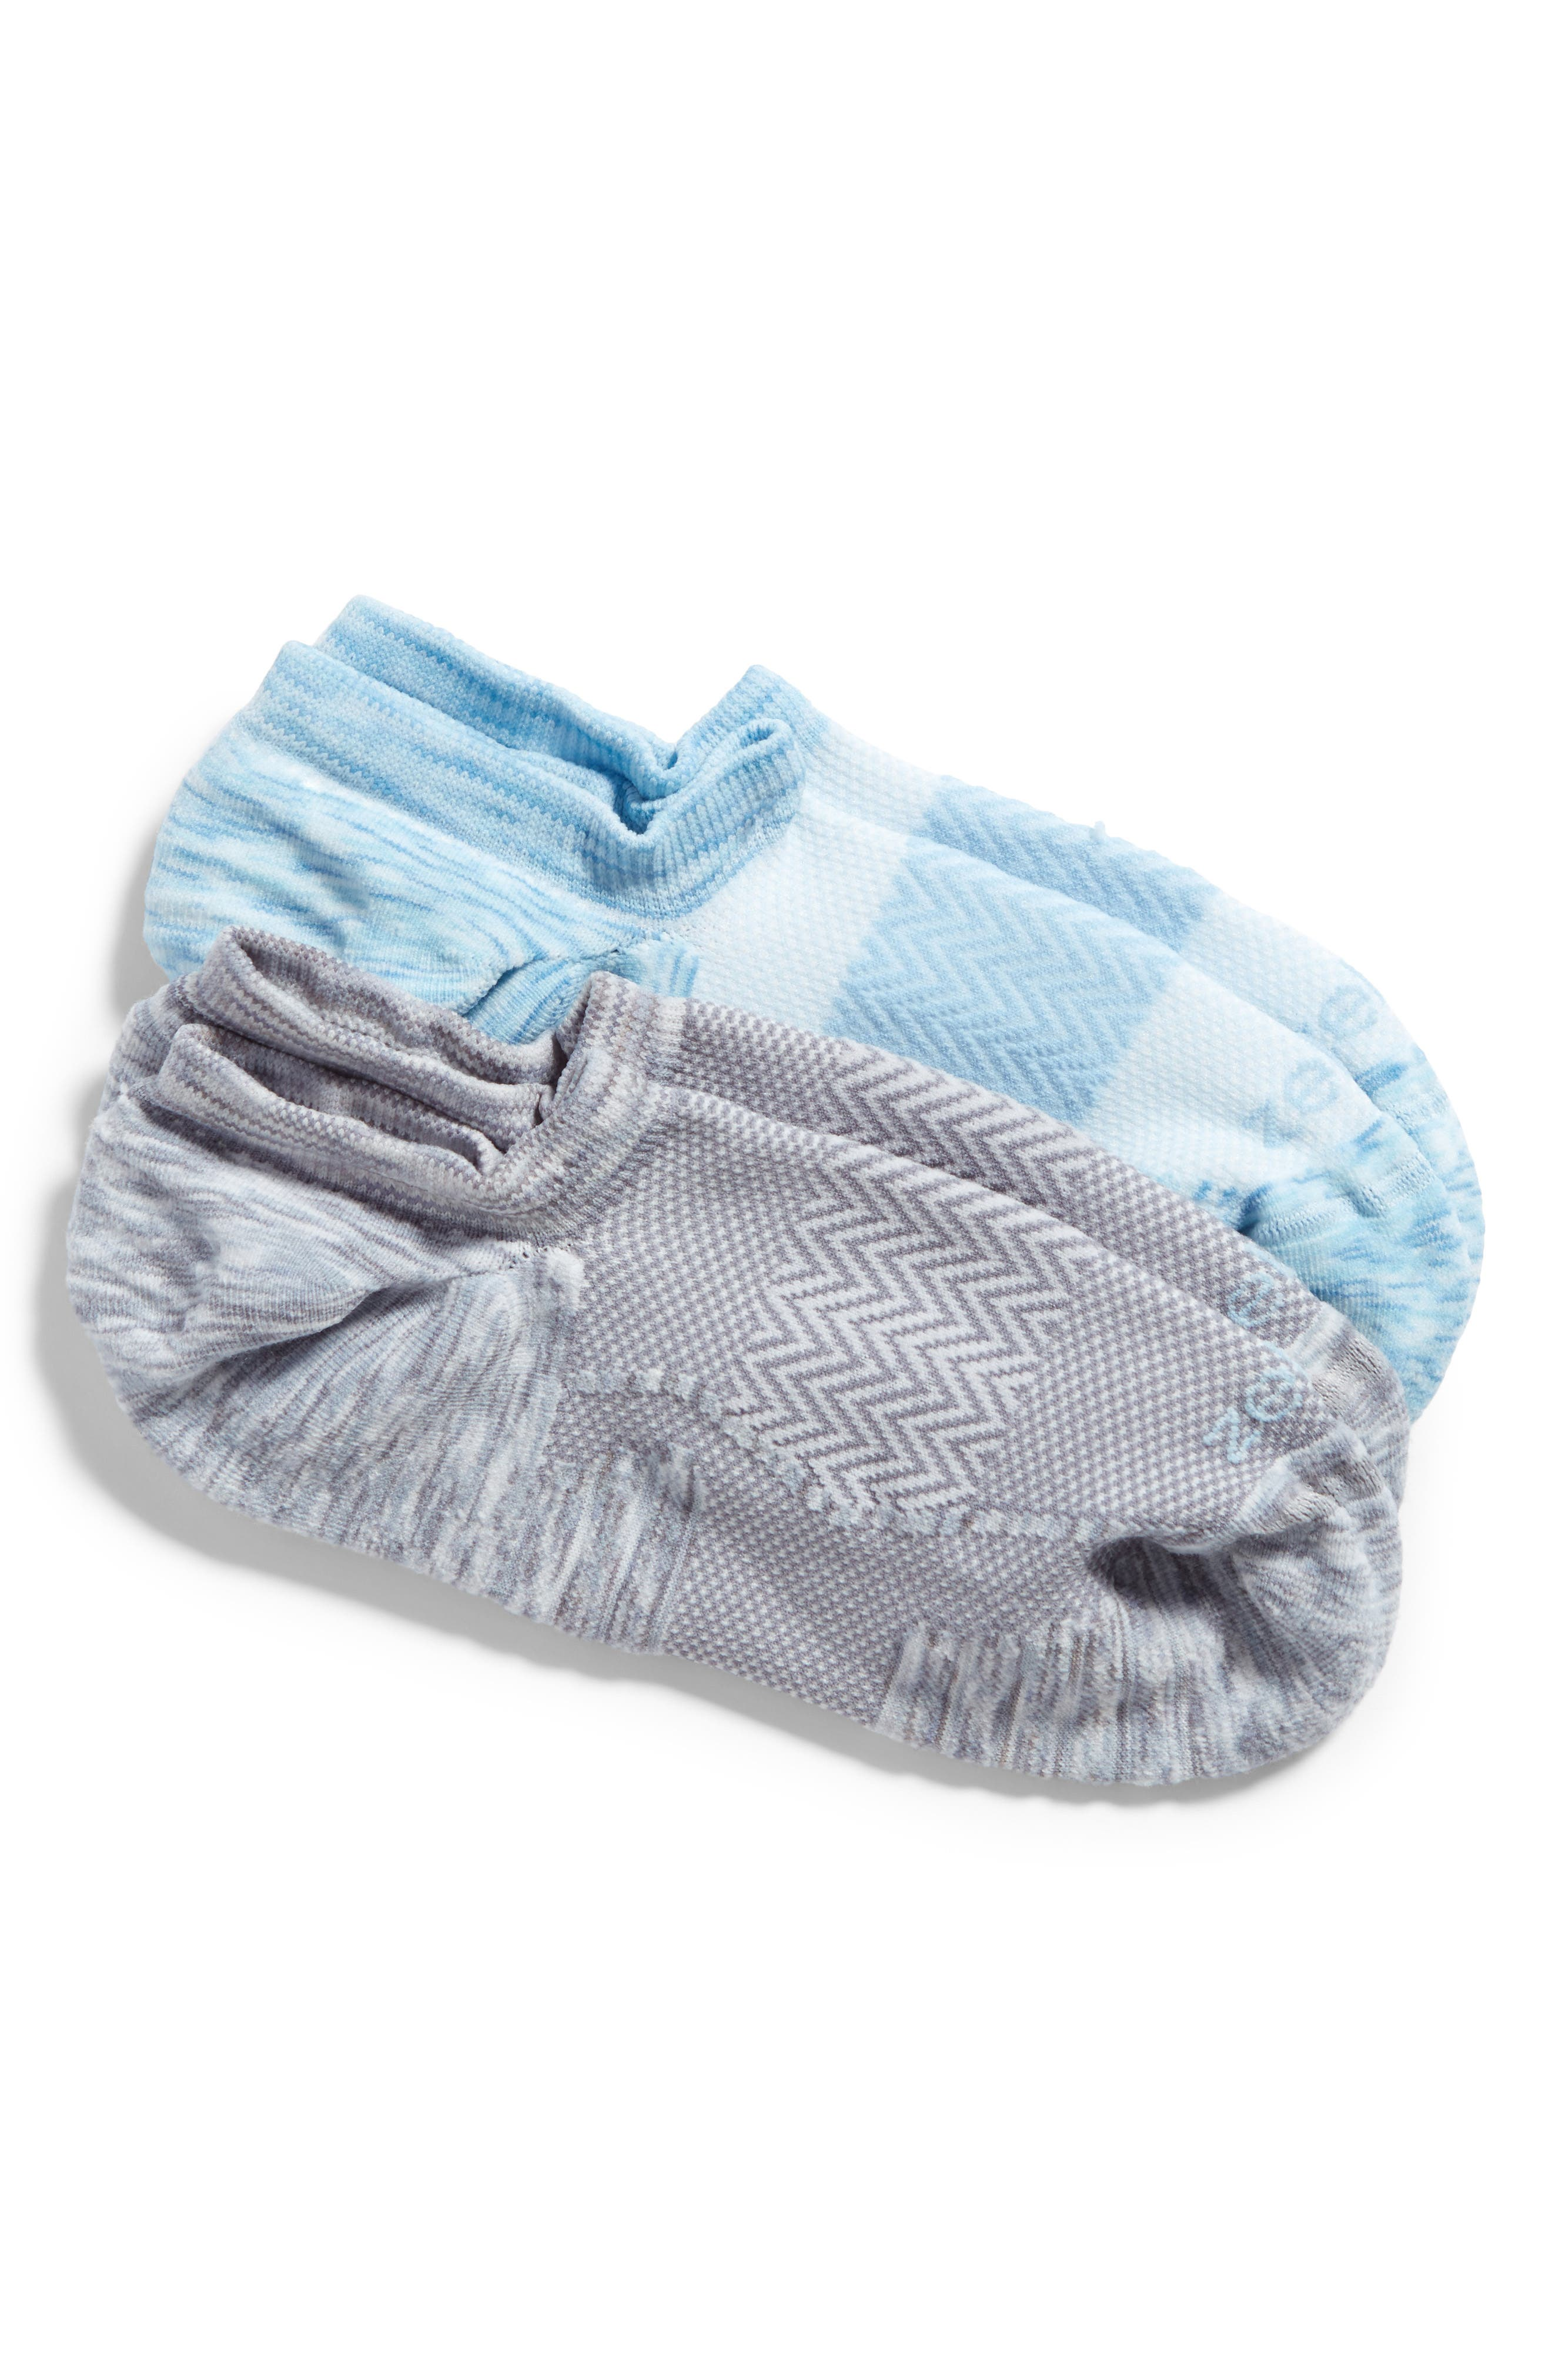 Zella 2-Pack Cushioned Low-Cut Running Socks